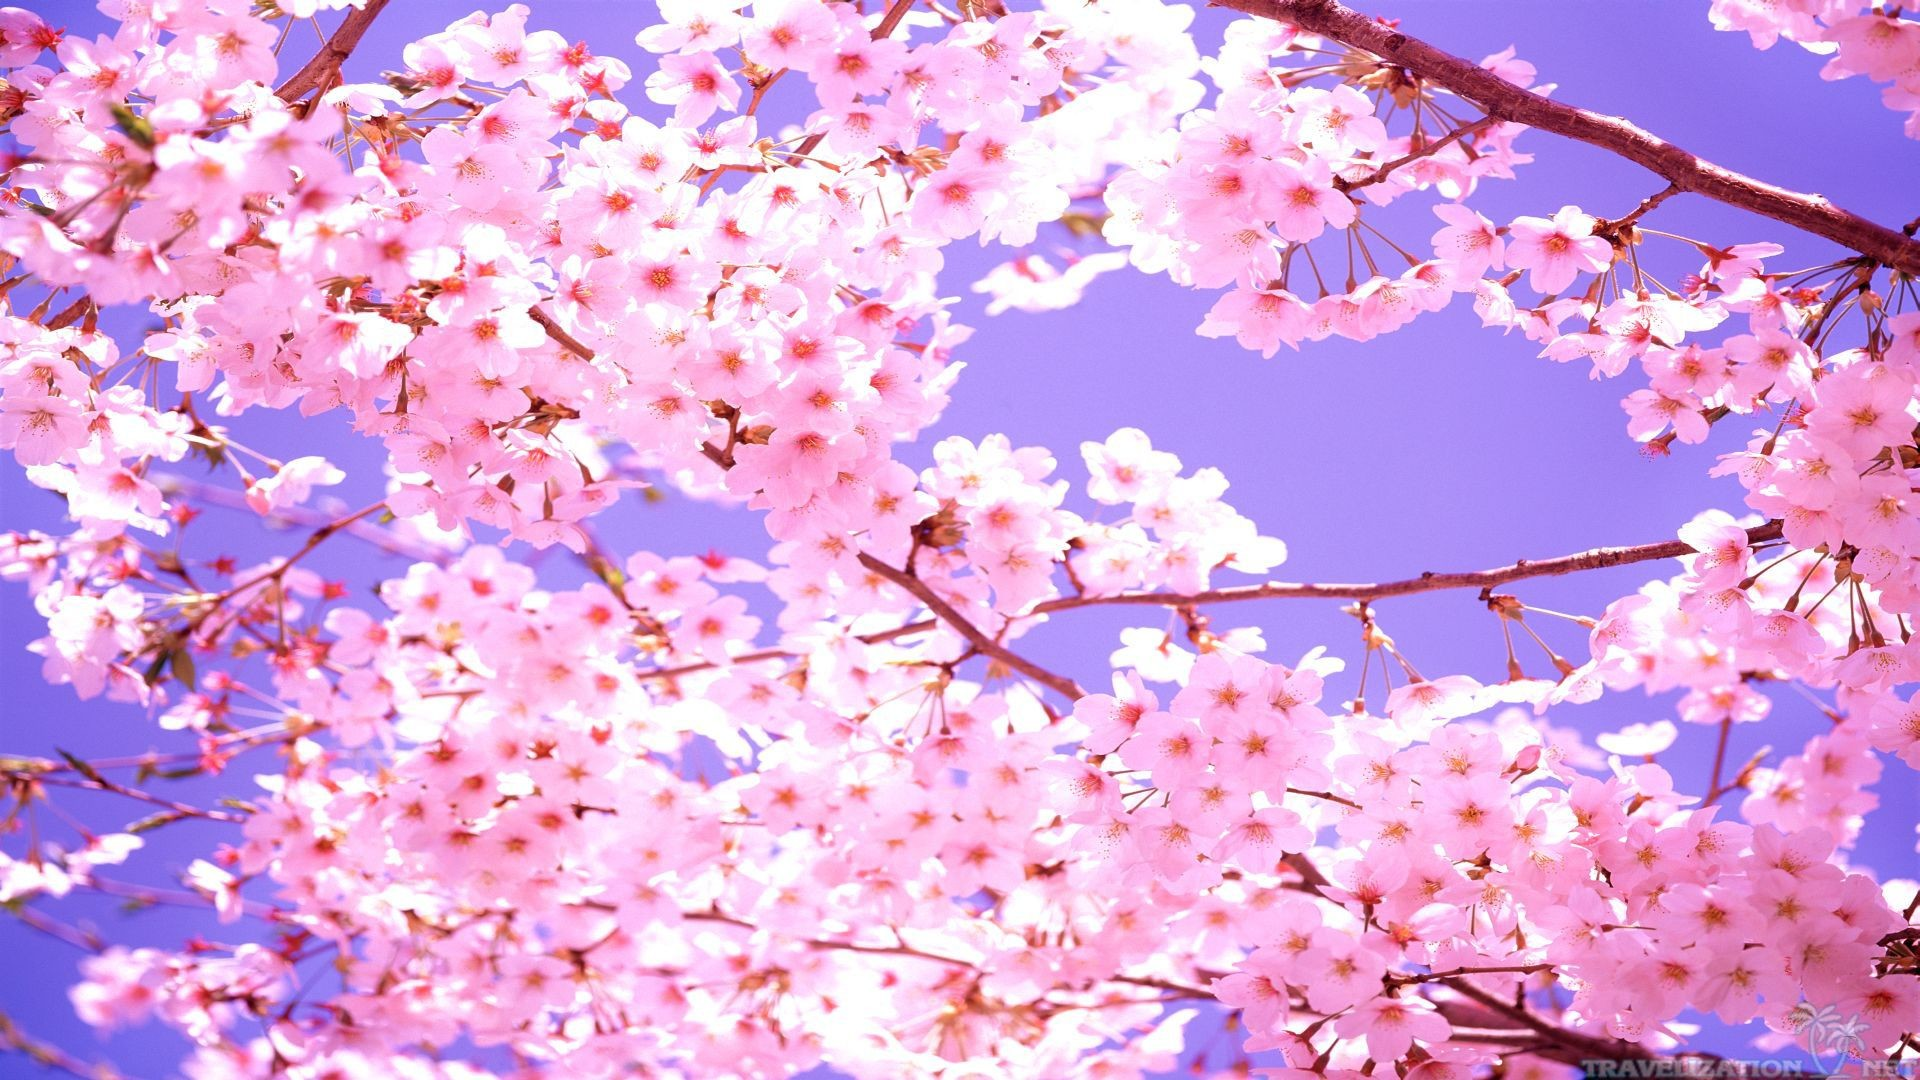 Обои цветы сакуры фото